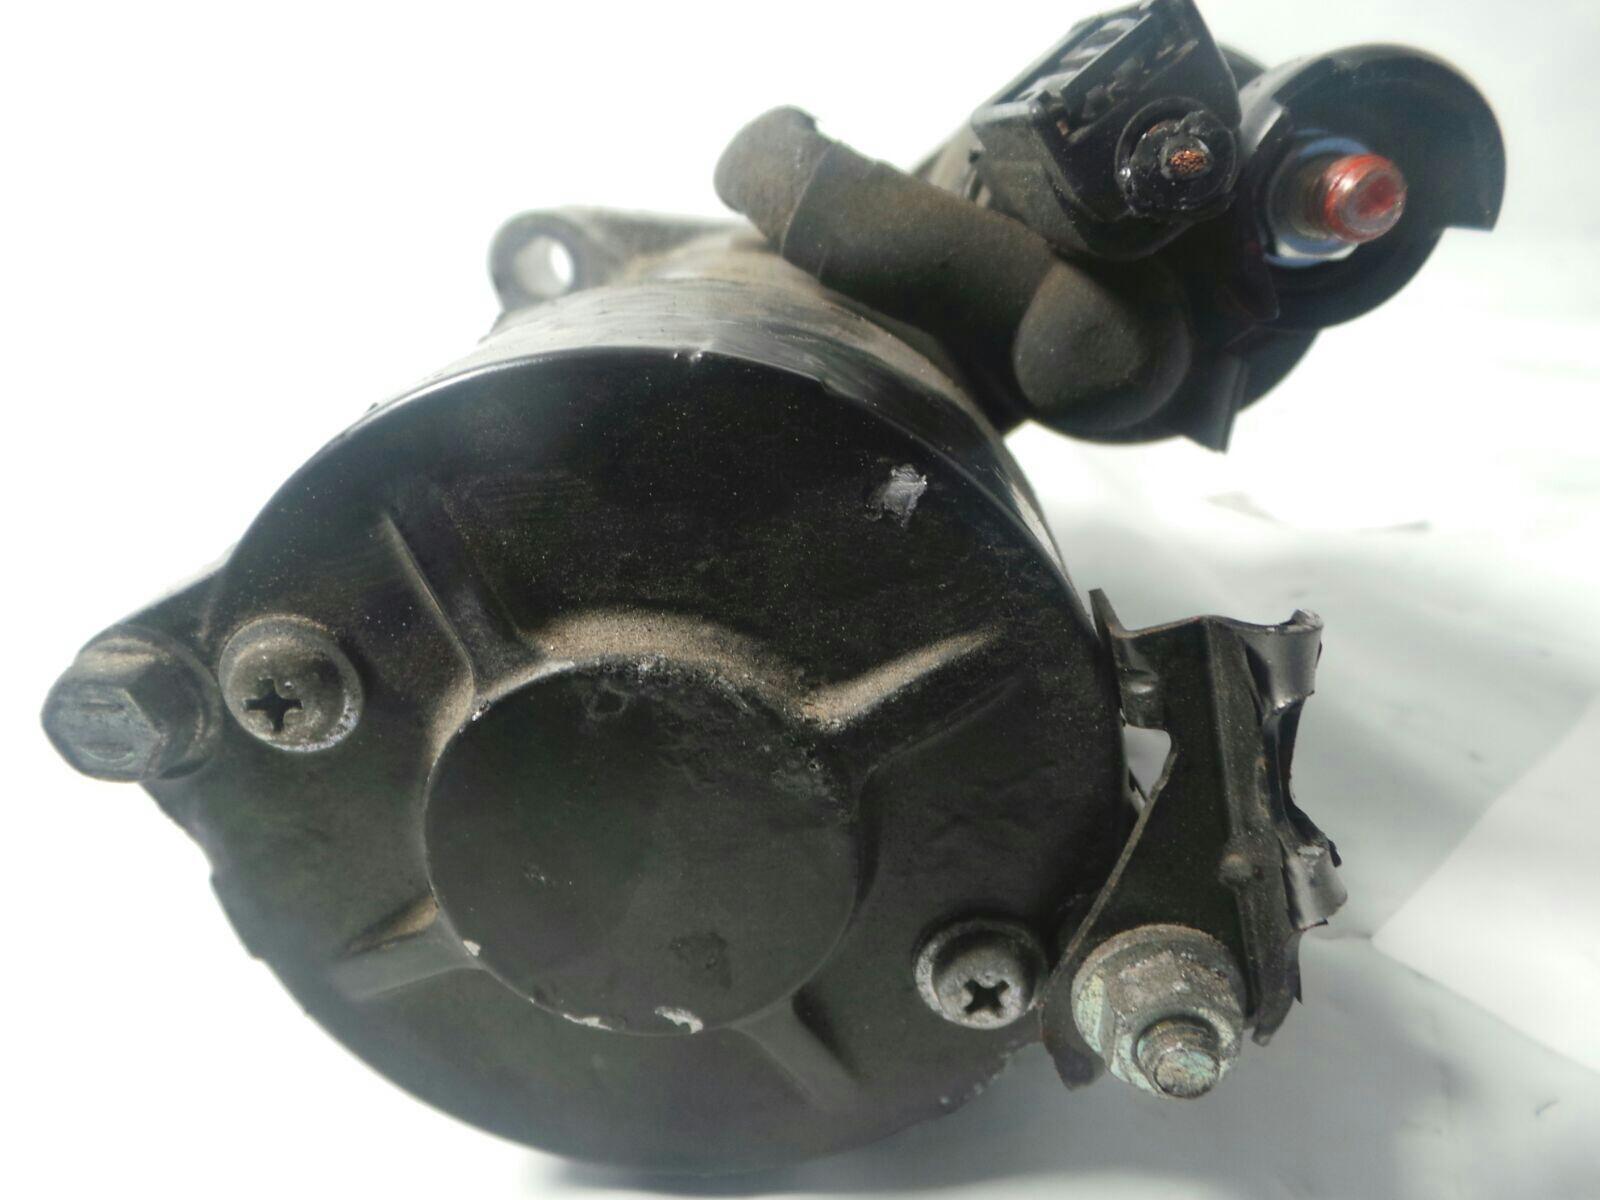 Honda Civic 2006 To 2010 Starter Motor Diesel Manual For Sale 22 06 10 N22a2 Warranty 5113440